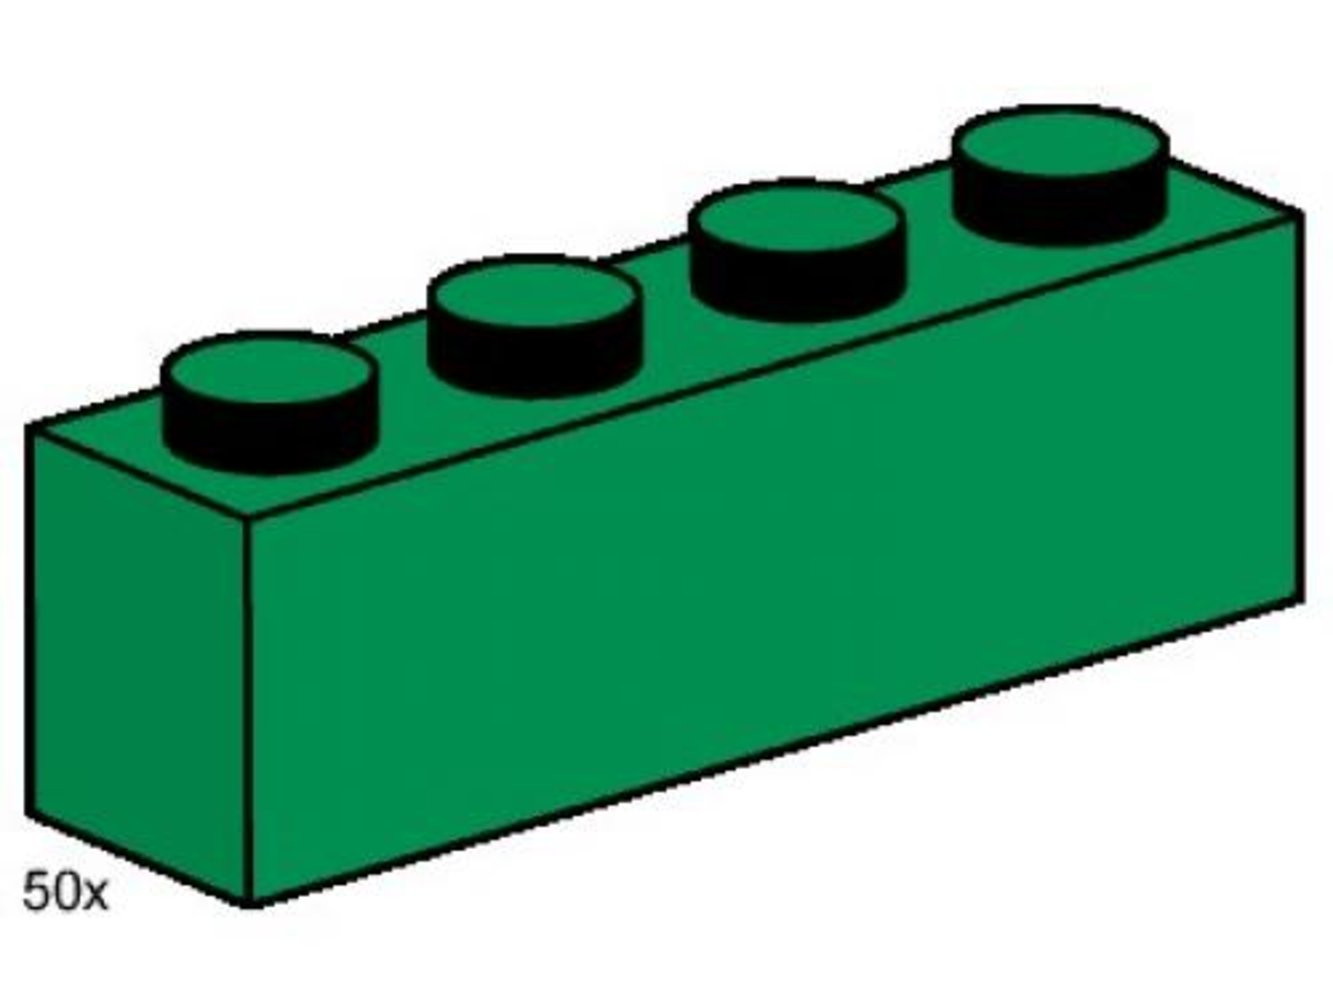 1 x 4 Dark Green Bricks